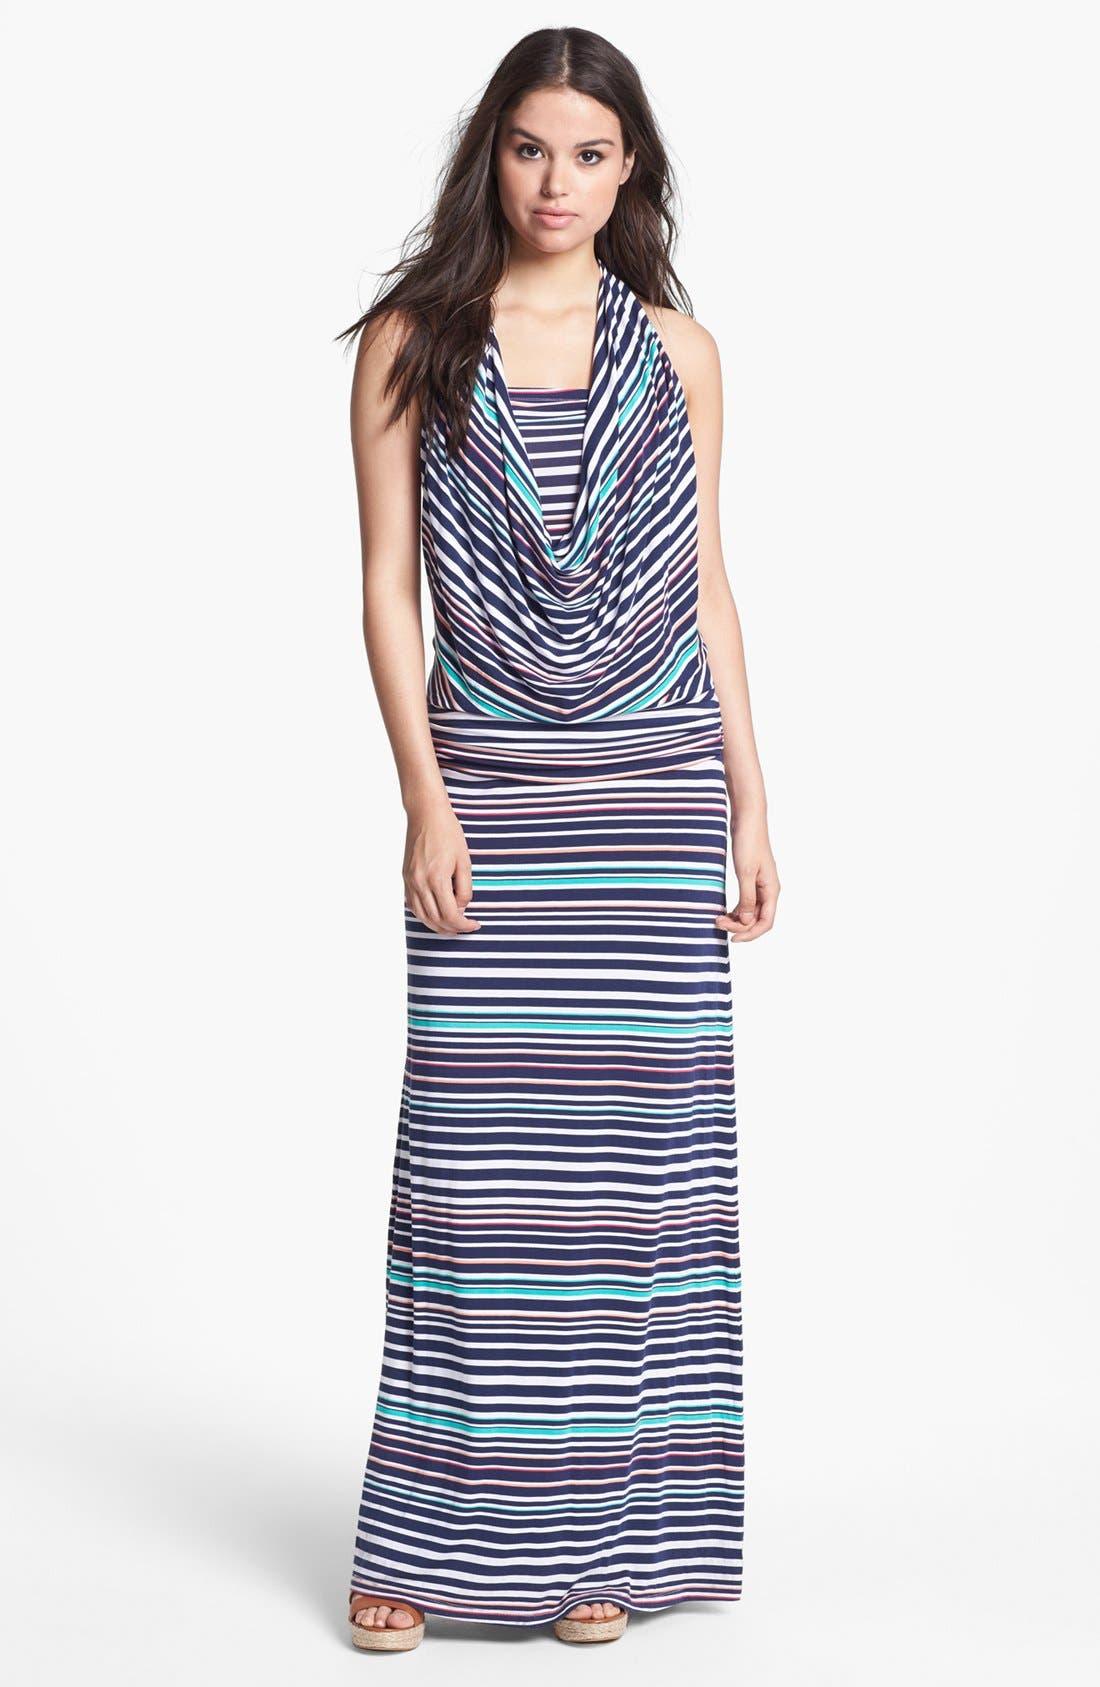 Alternate Image 1 Selected - Tart 'Mae' Convertible Stripe Jersey Maxi Dress